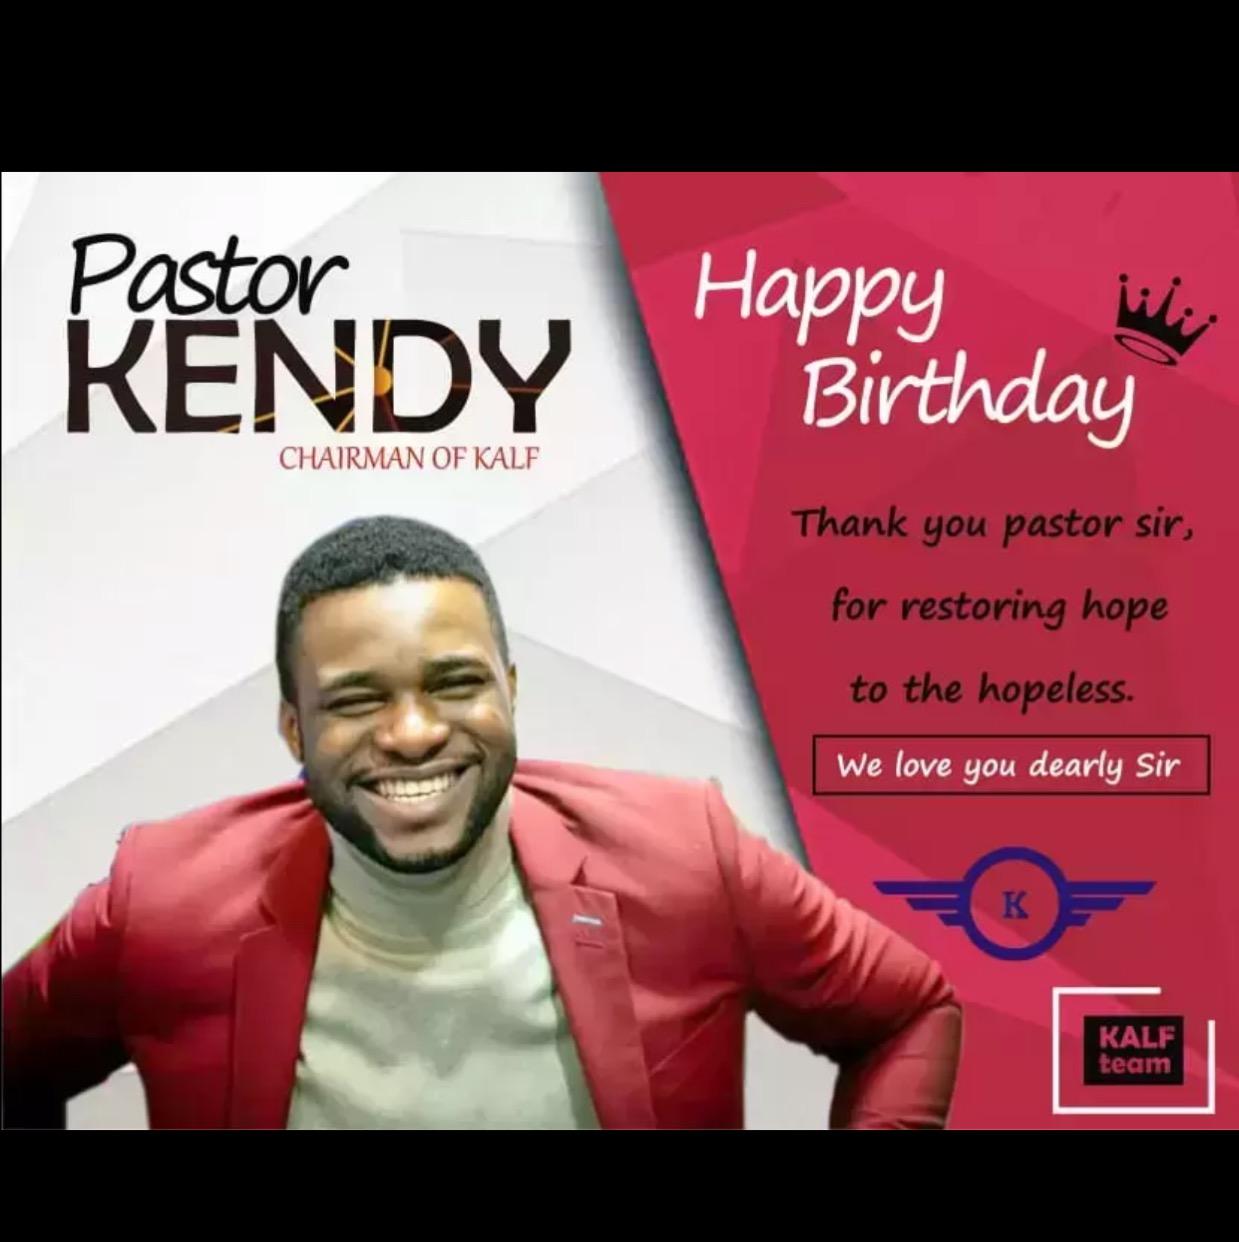 Happy Birthday Pastor Kendy! You